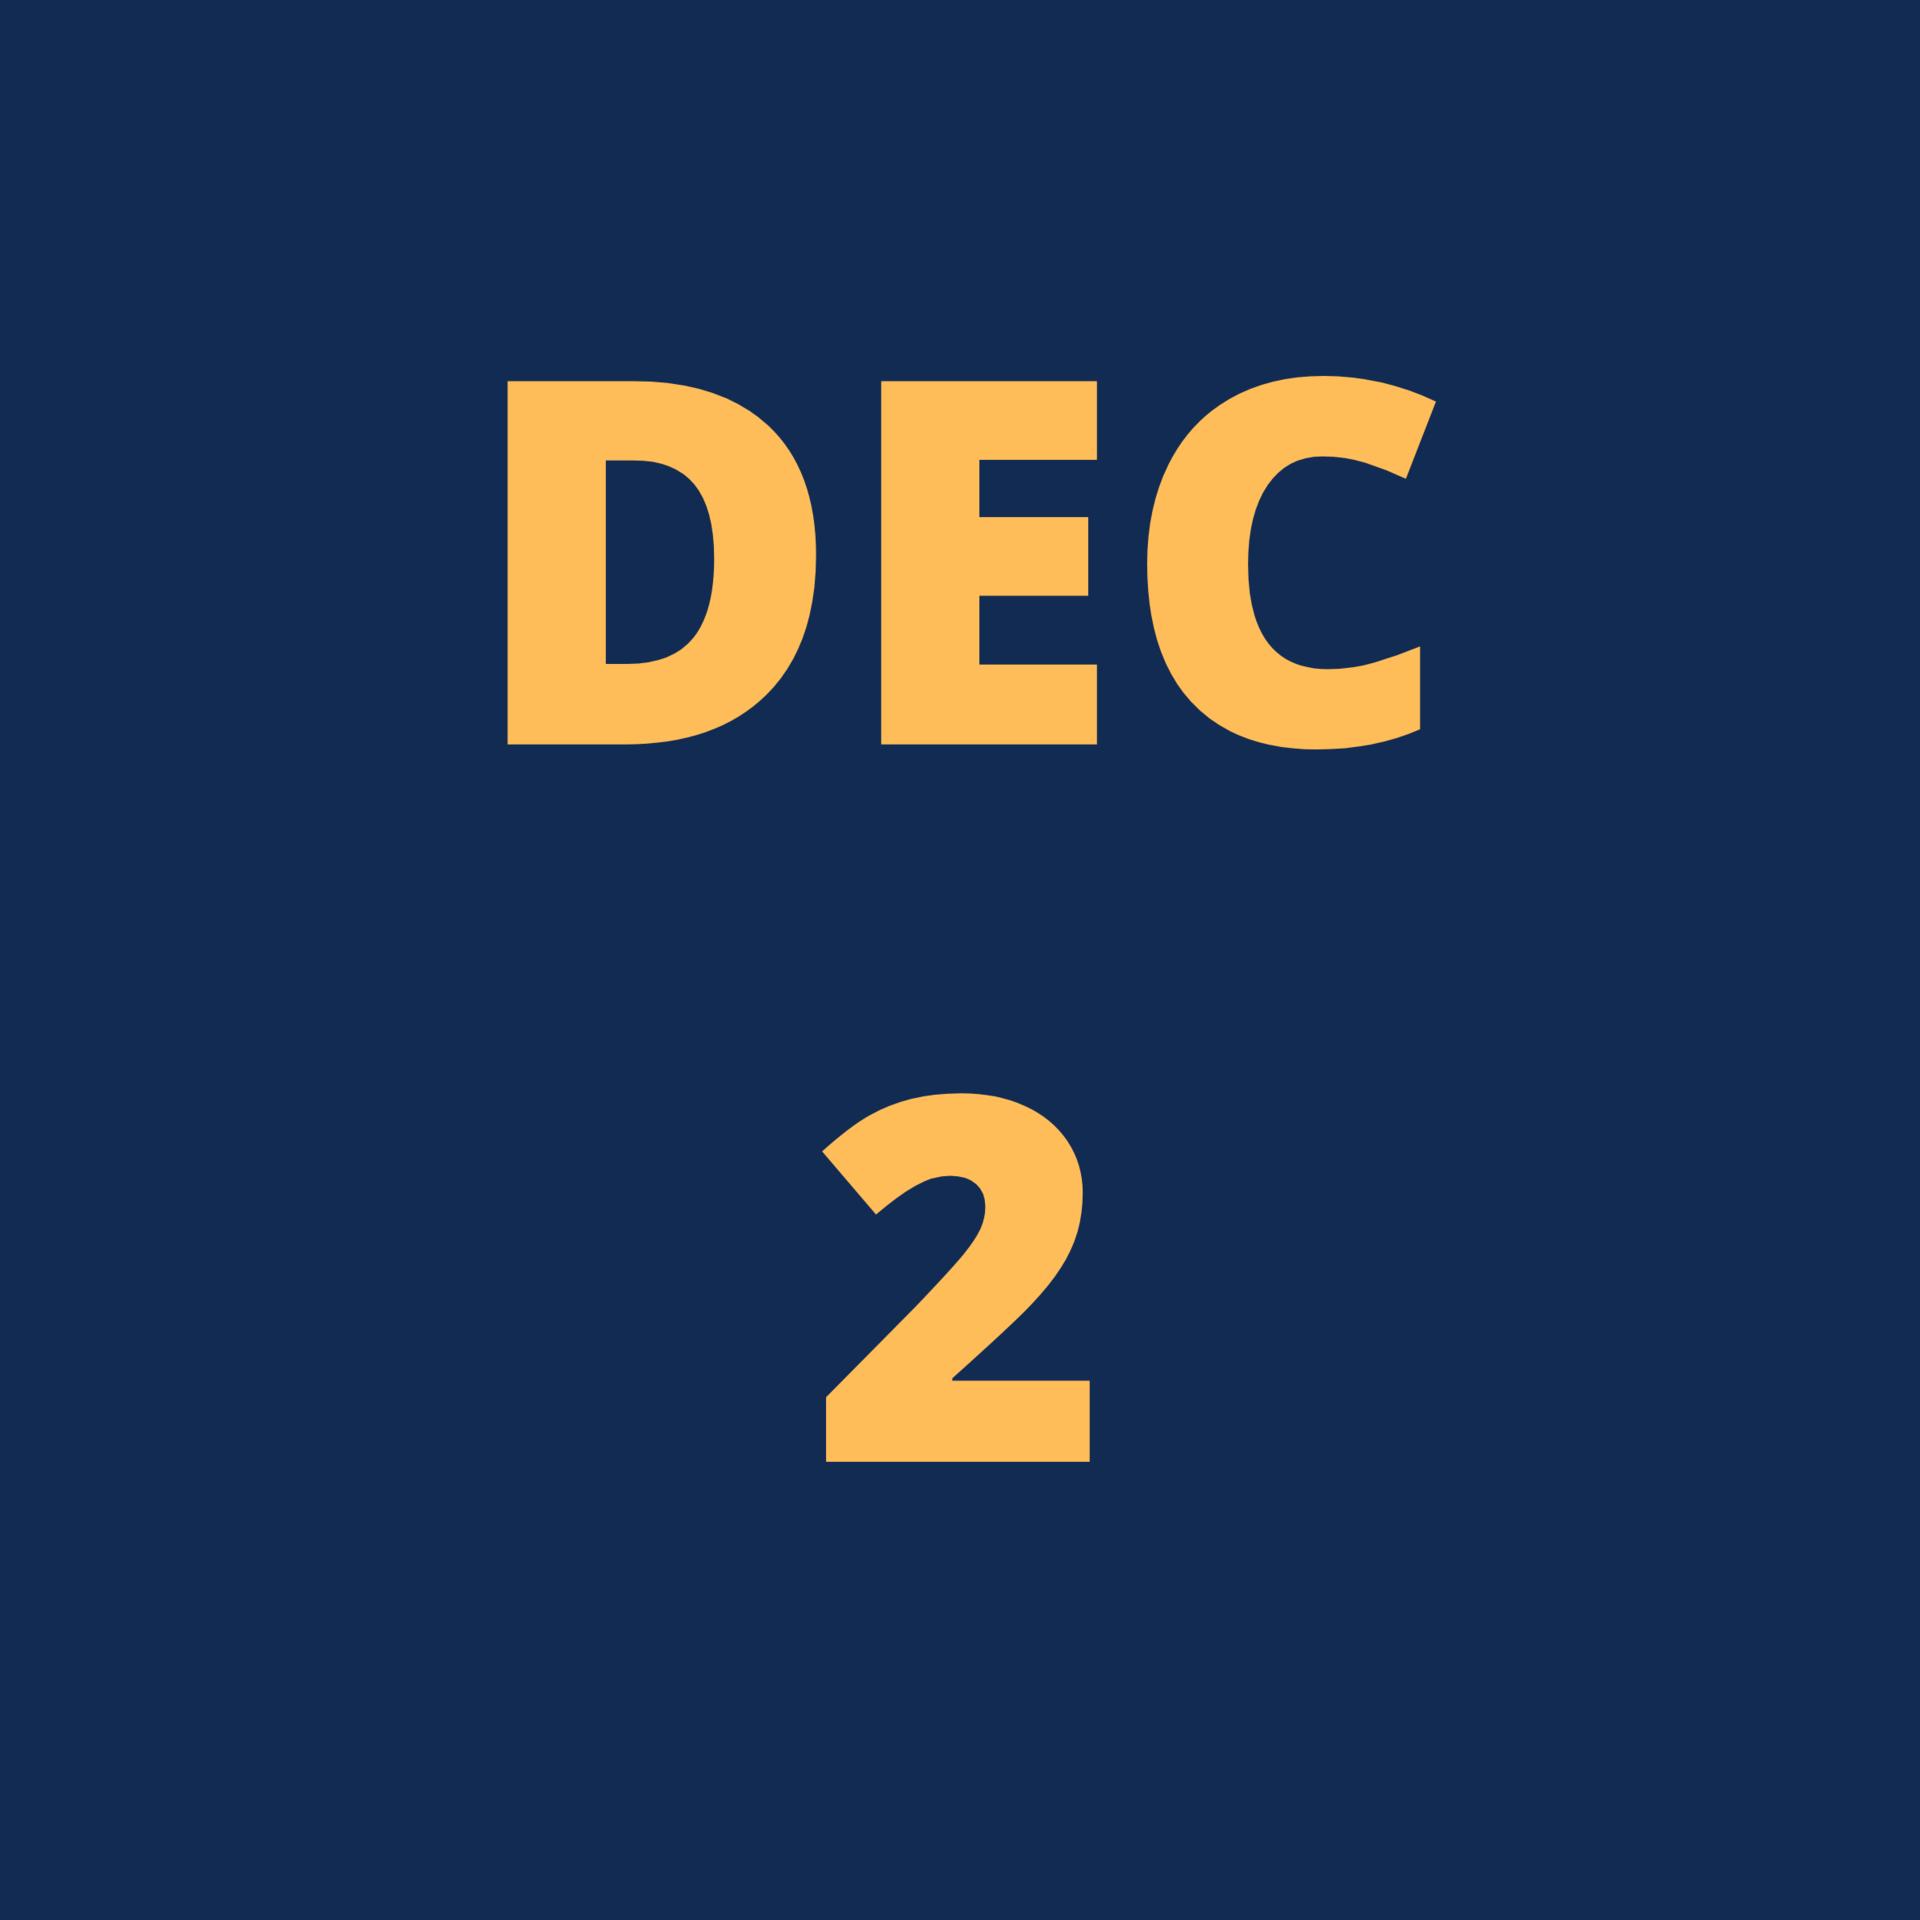 Dec 2 Icon